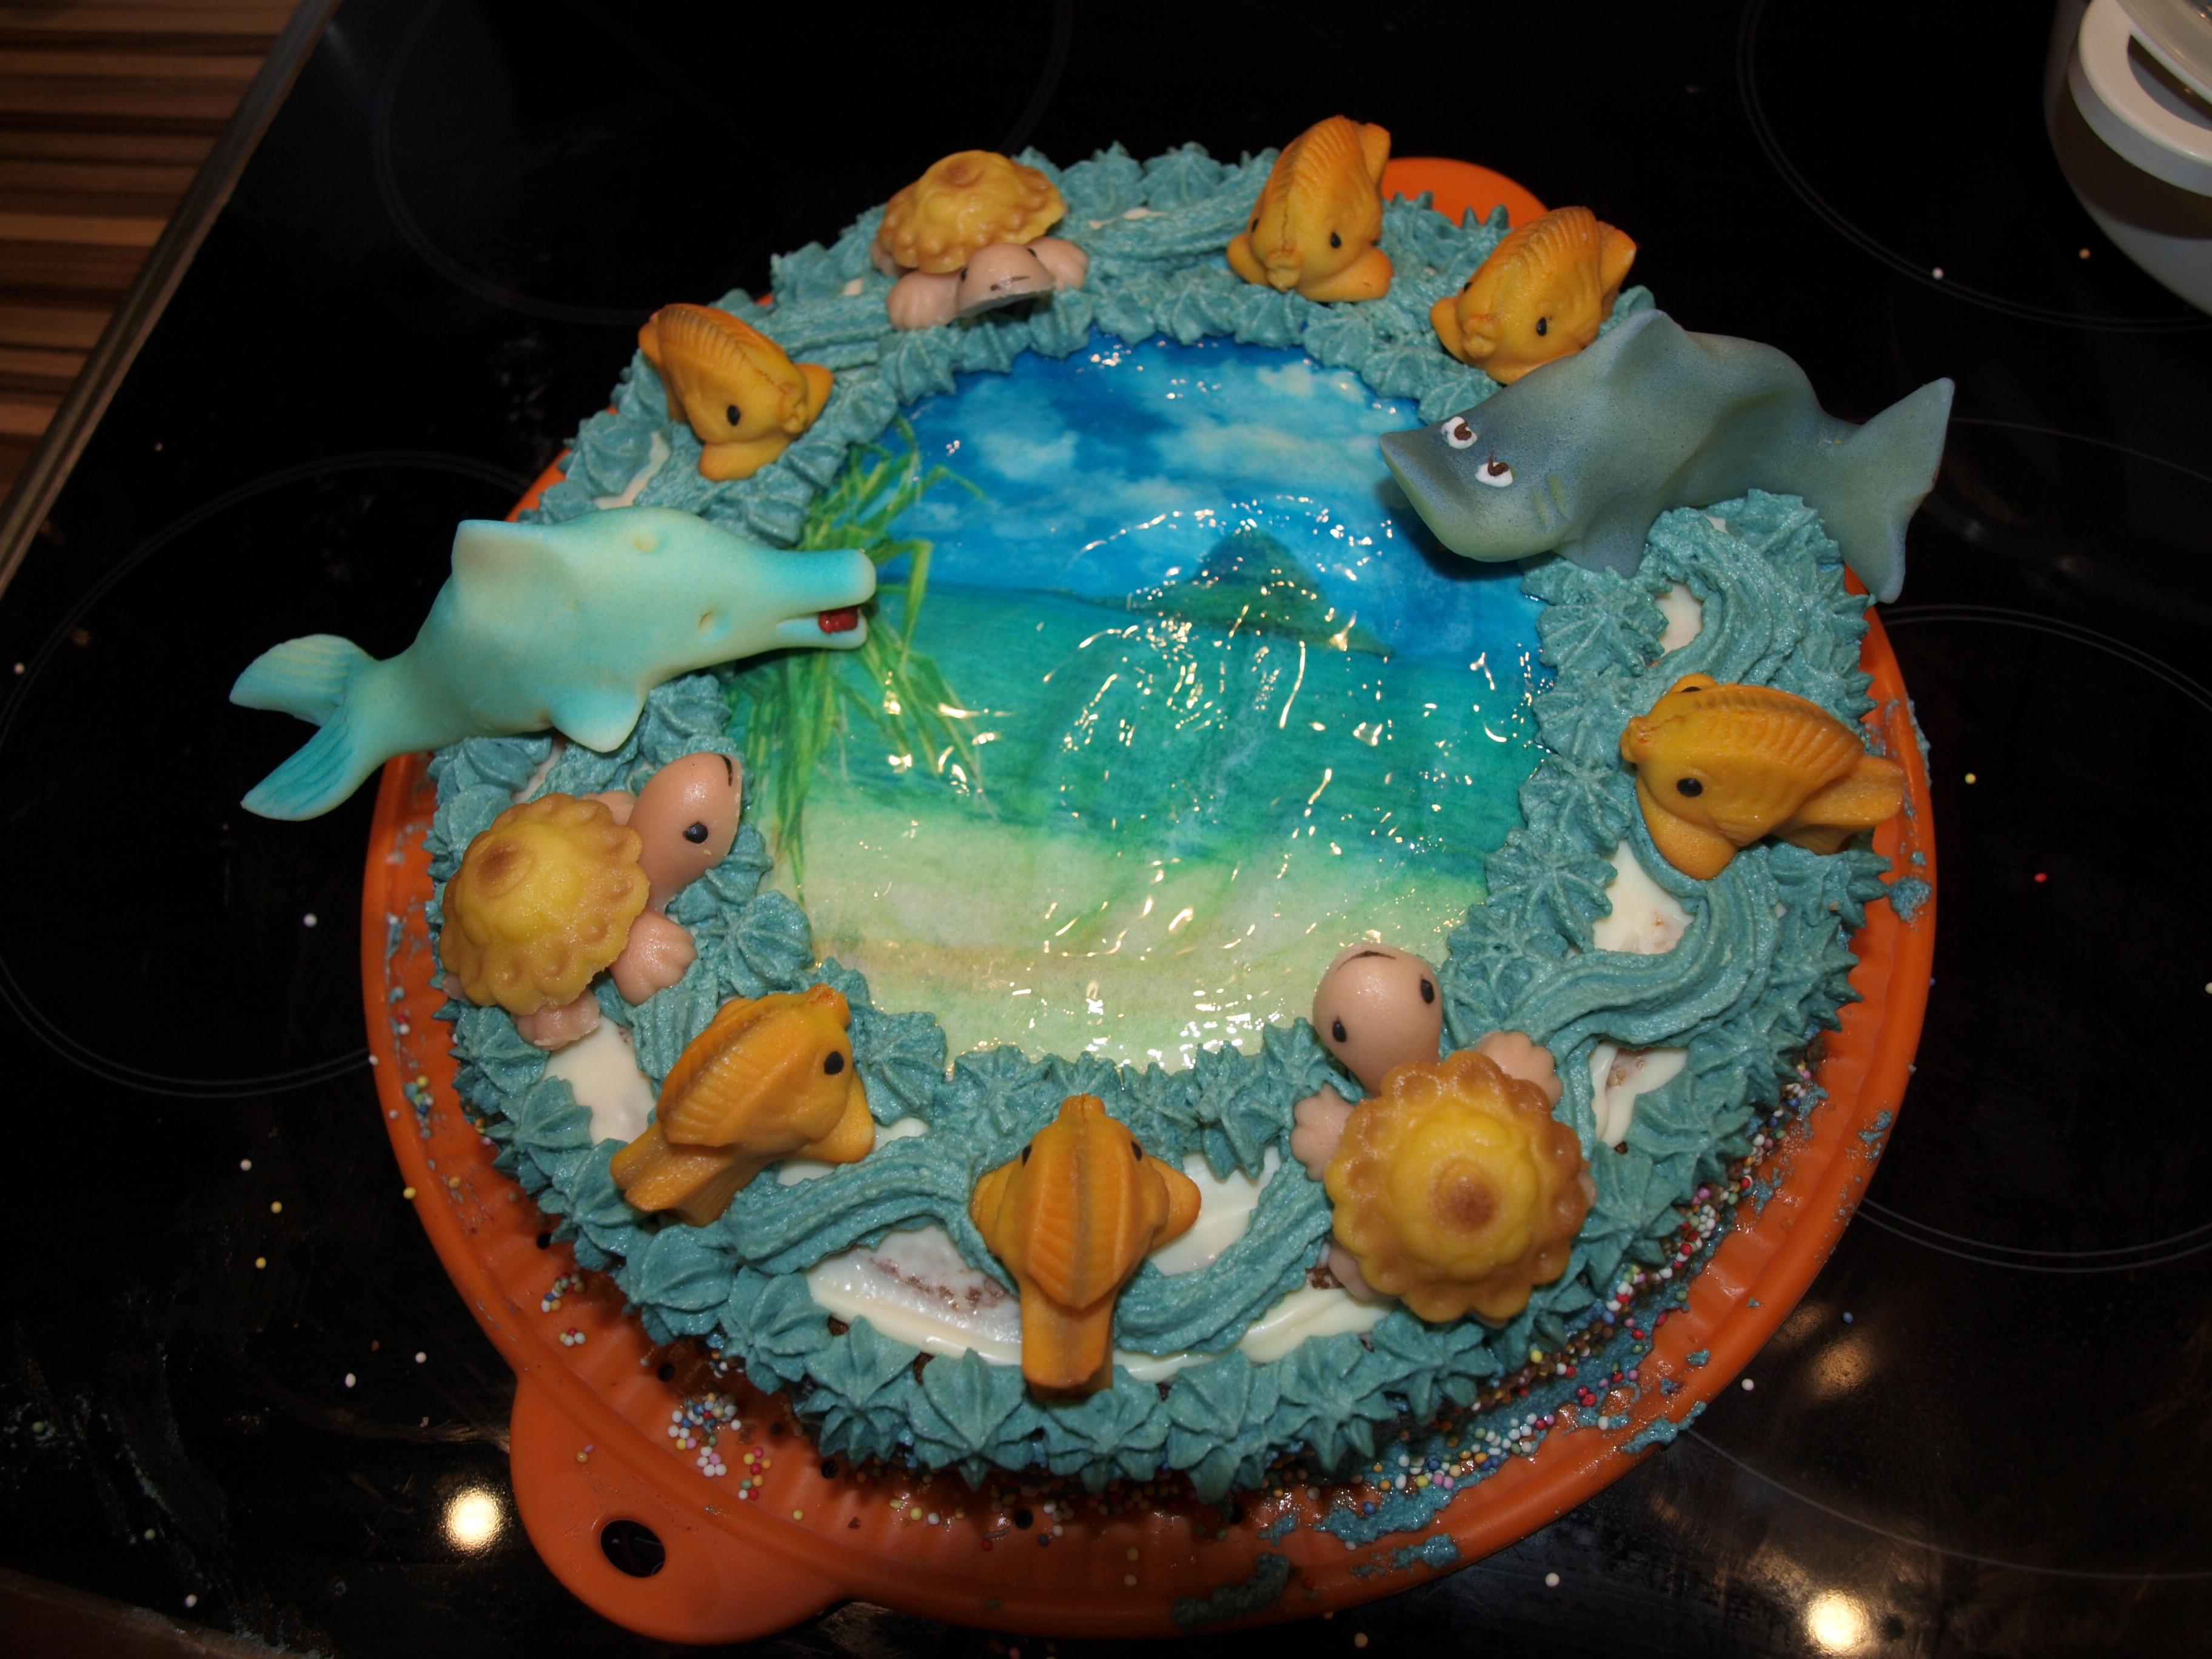 celebracion comida postre cocina pastel pastel de cumpleaos velas formacin de hielo fondant cumpleaos productos horneados